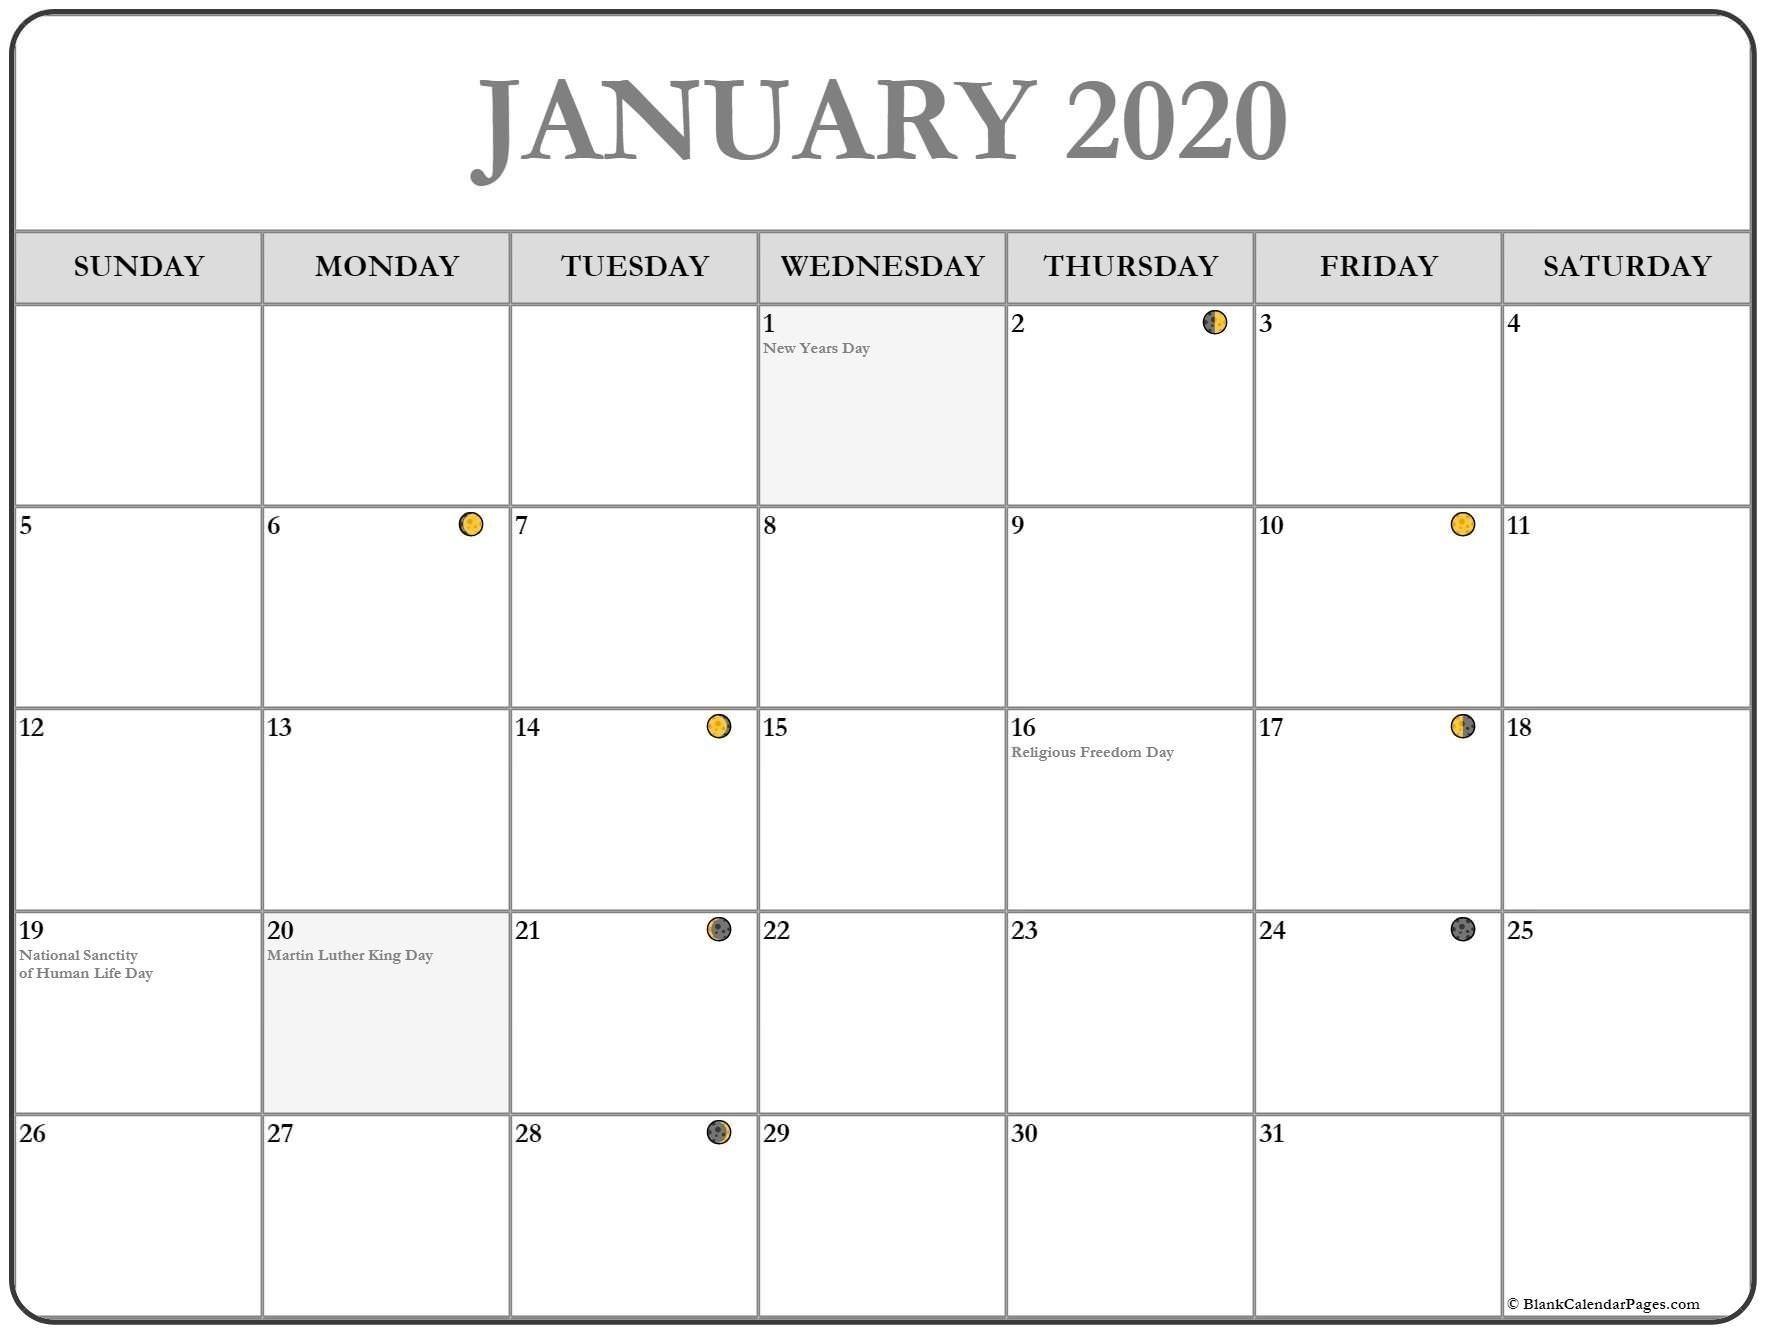 December 2019 January 2020 Calendar Printable | Calendar-Kenny The Pirate Crowd Calendar January 2020